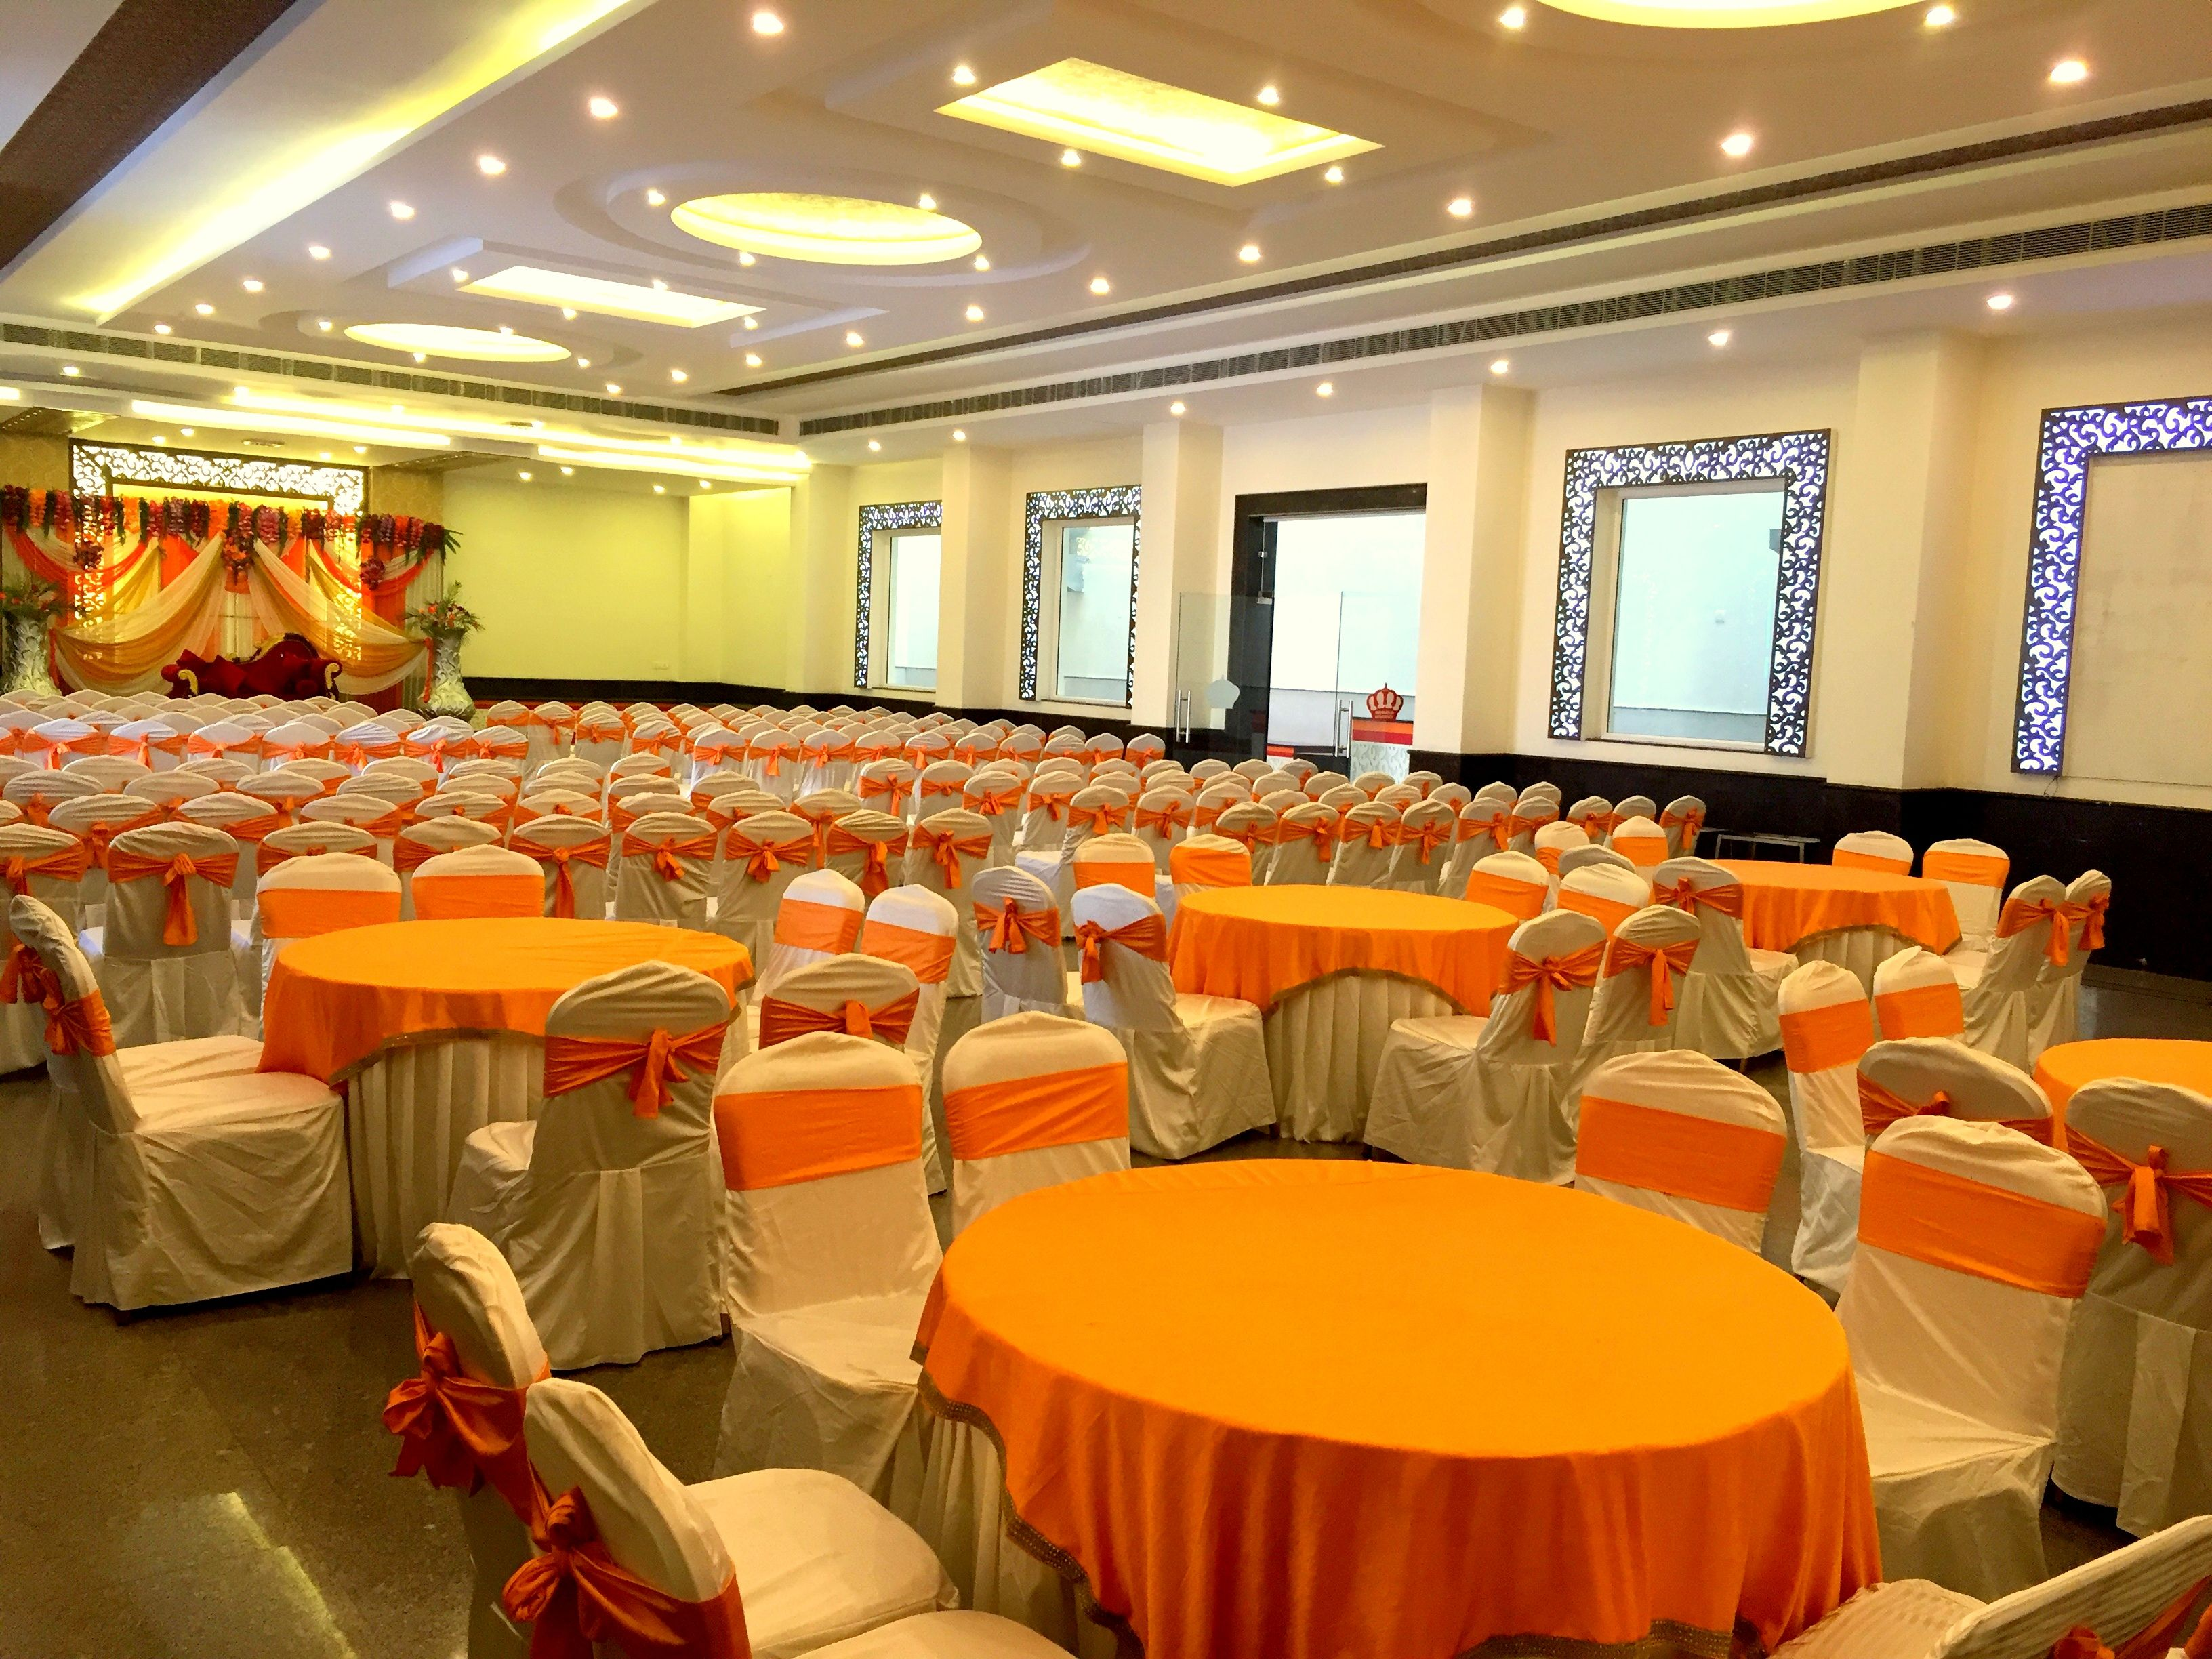 Banquet hall at hotel maharaja residency jalandhar new railway road banquet hall at hotel maharaja residency jalandhar new railway road junglespirit Gallery